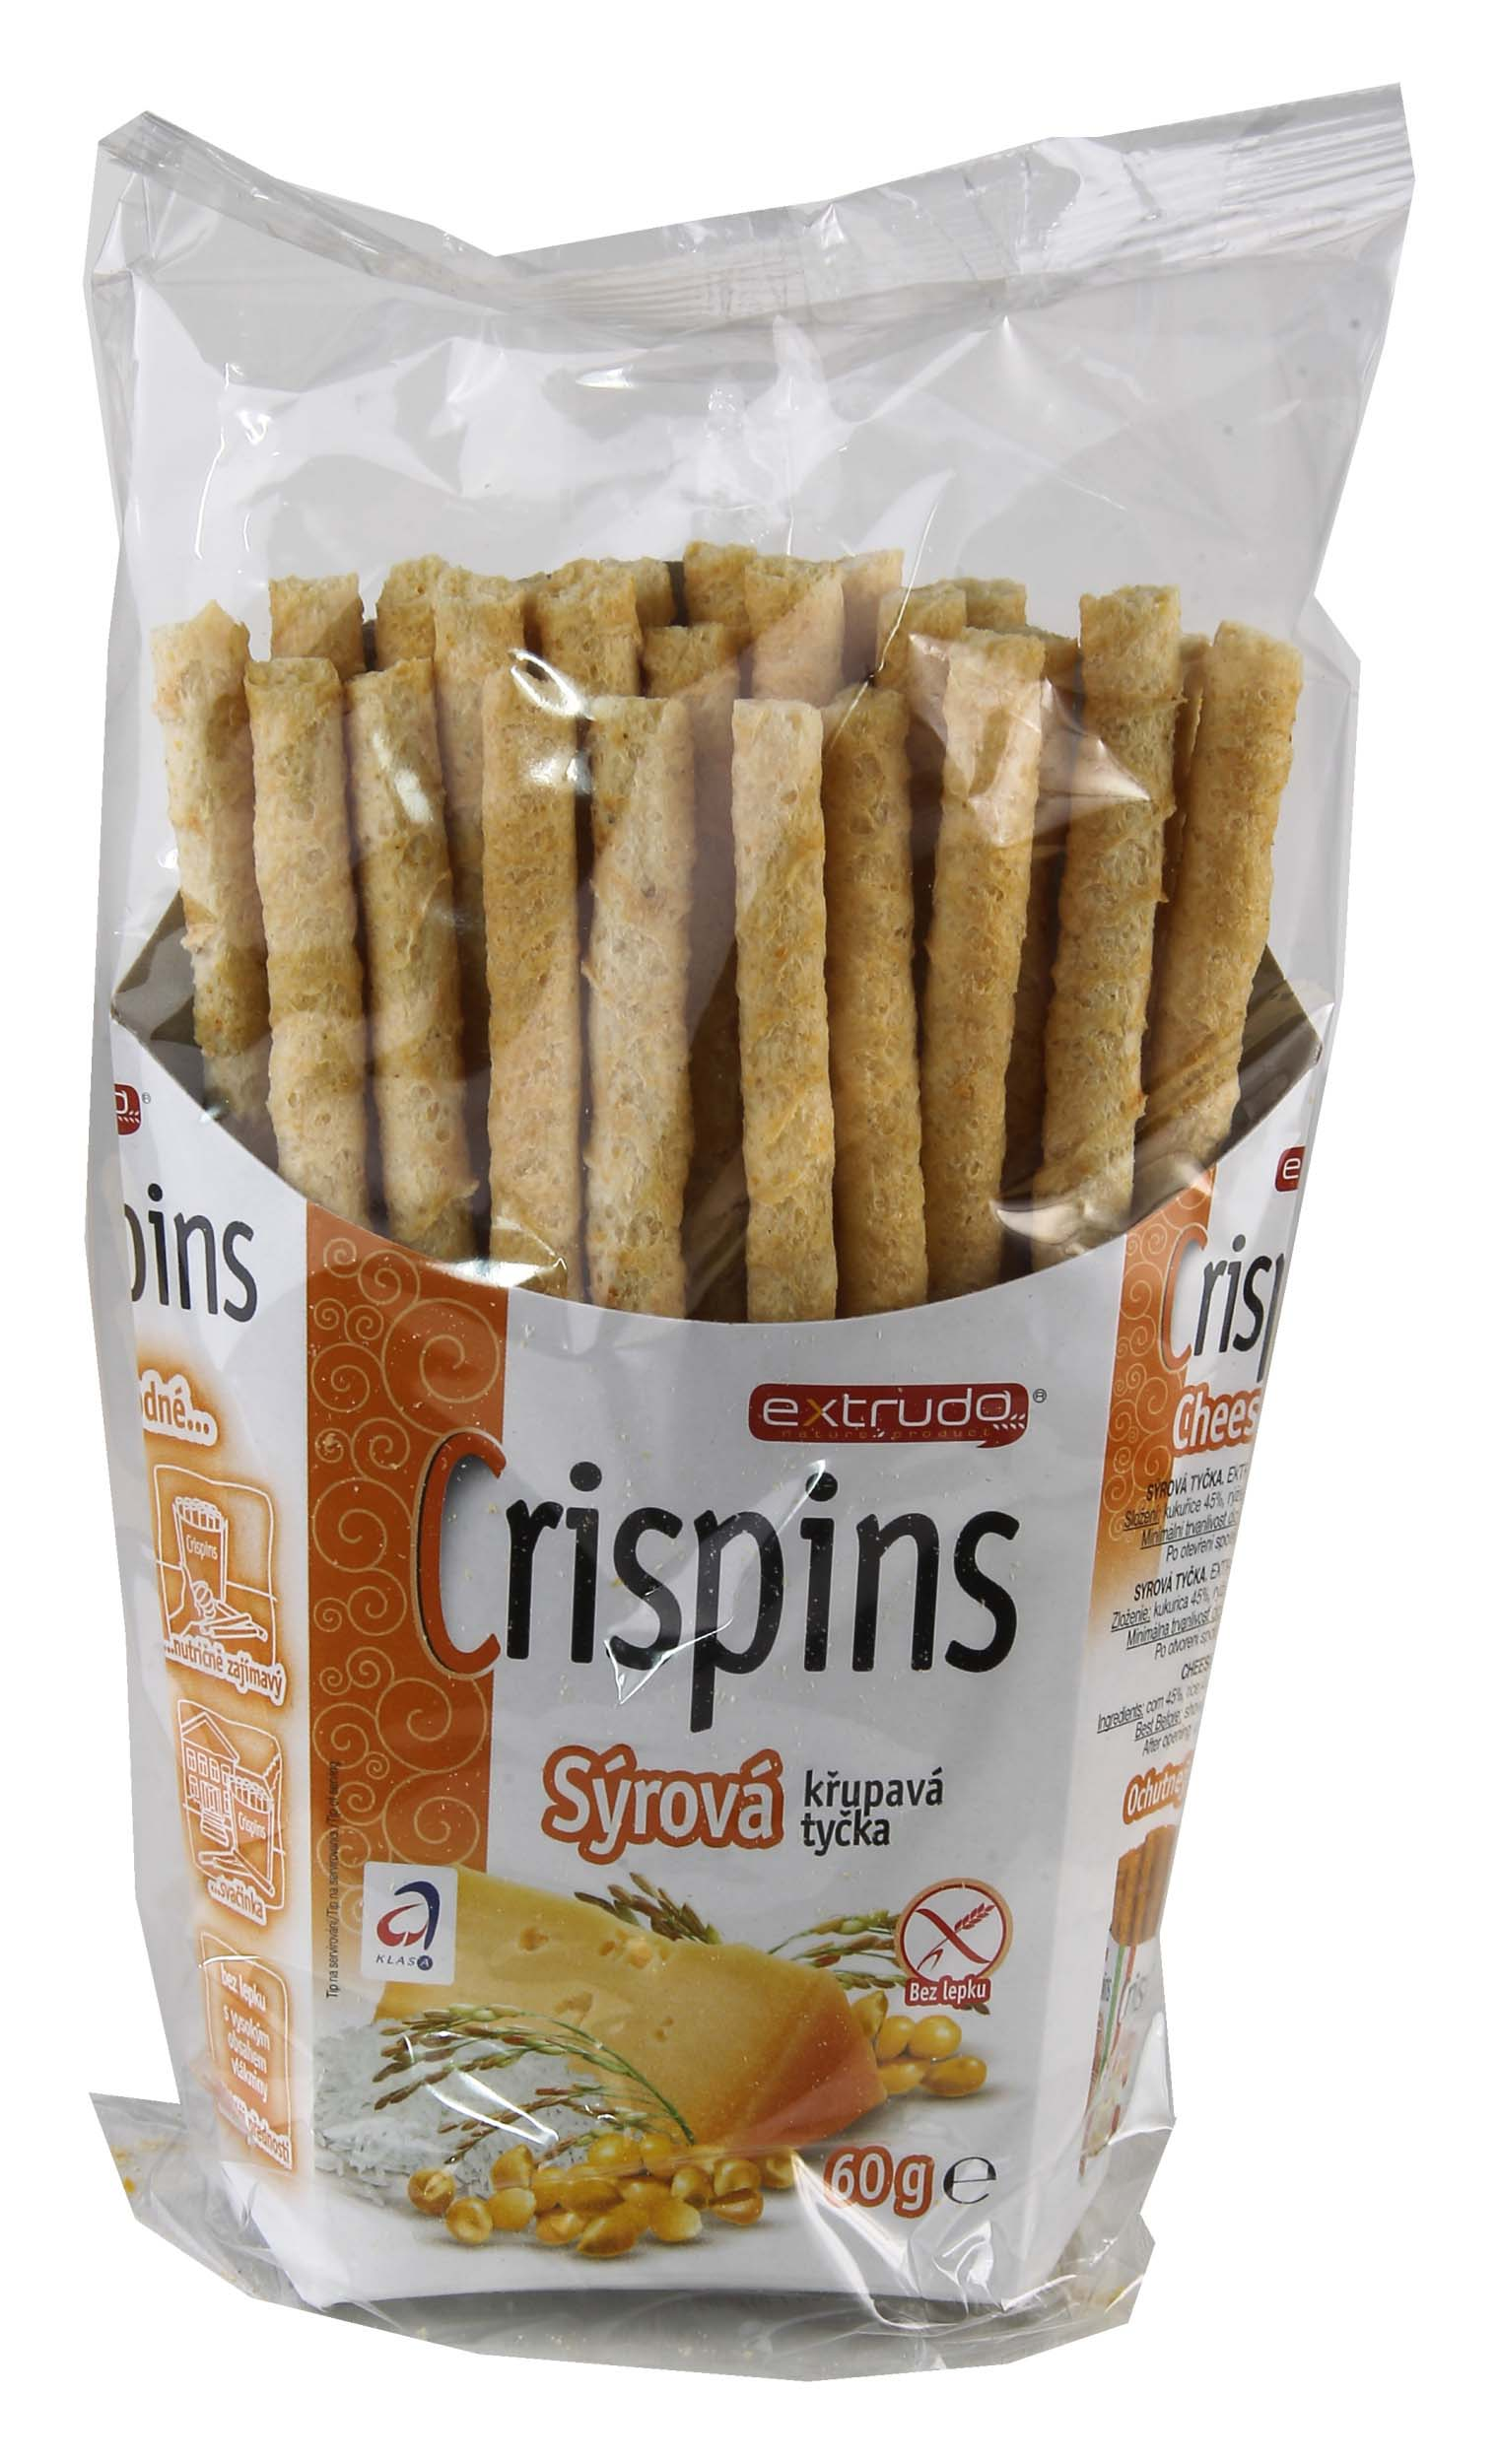 Crispins tyčka sýr 60g bez lepku